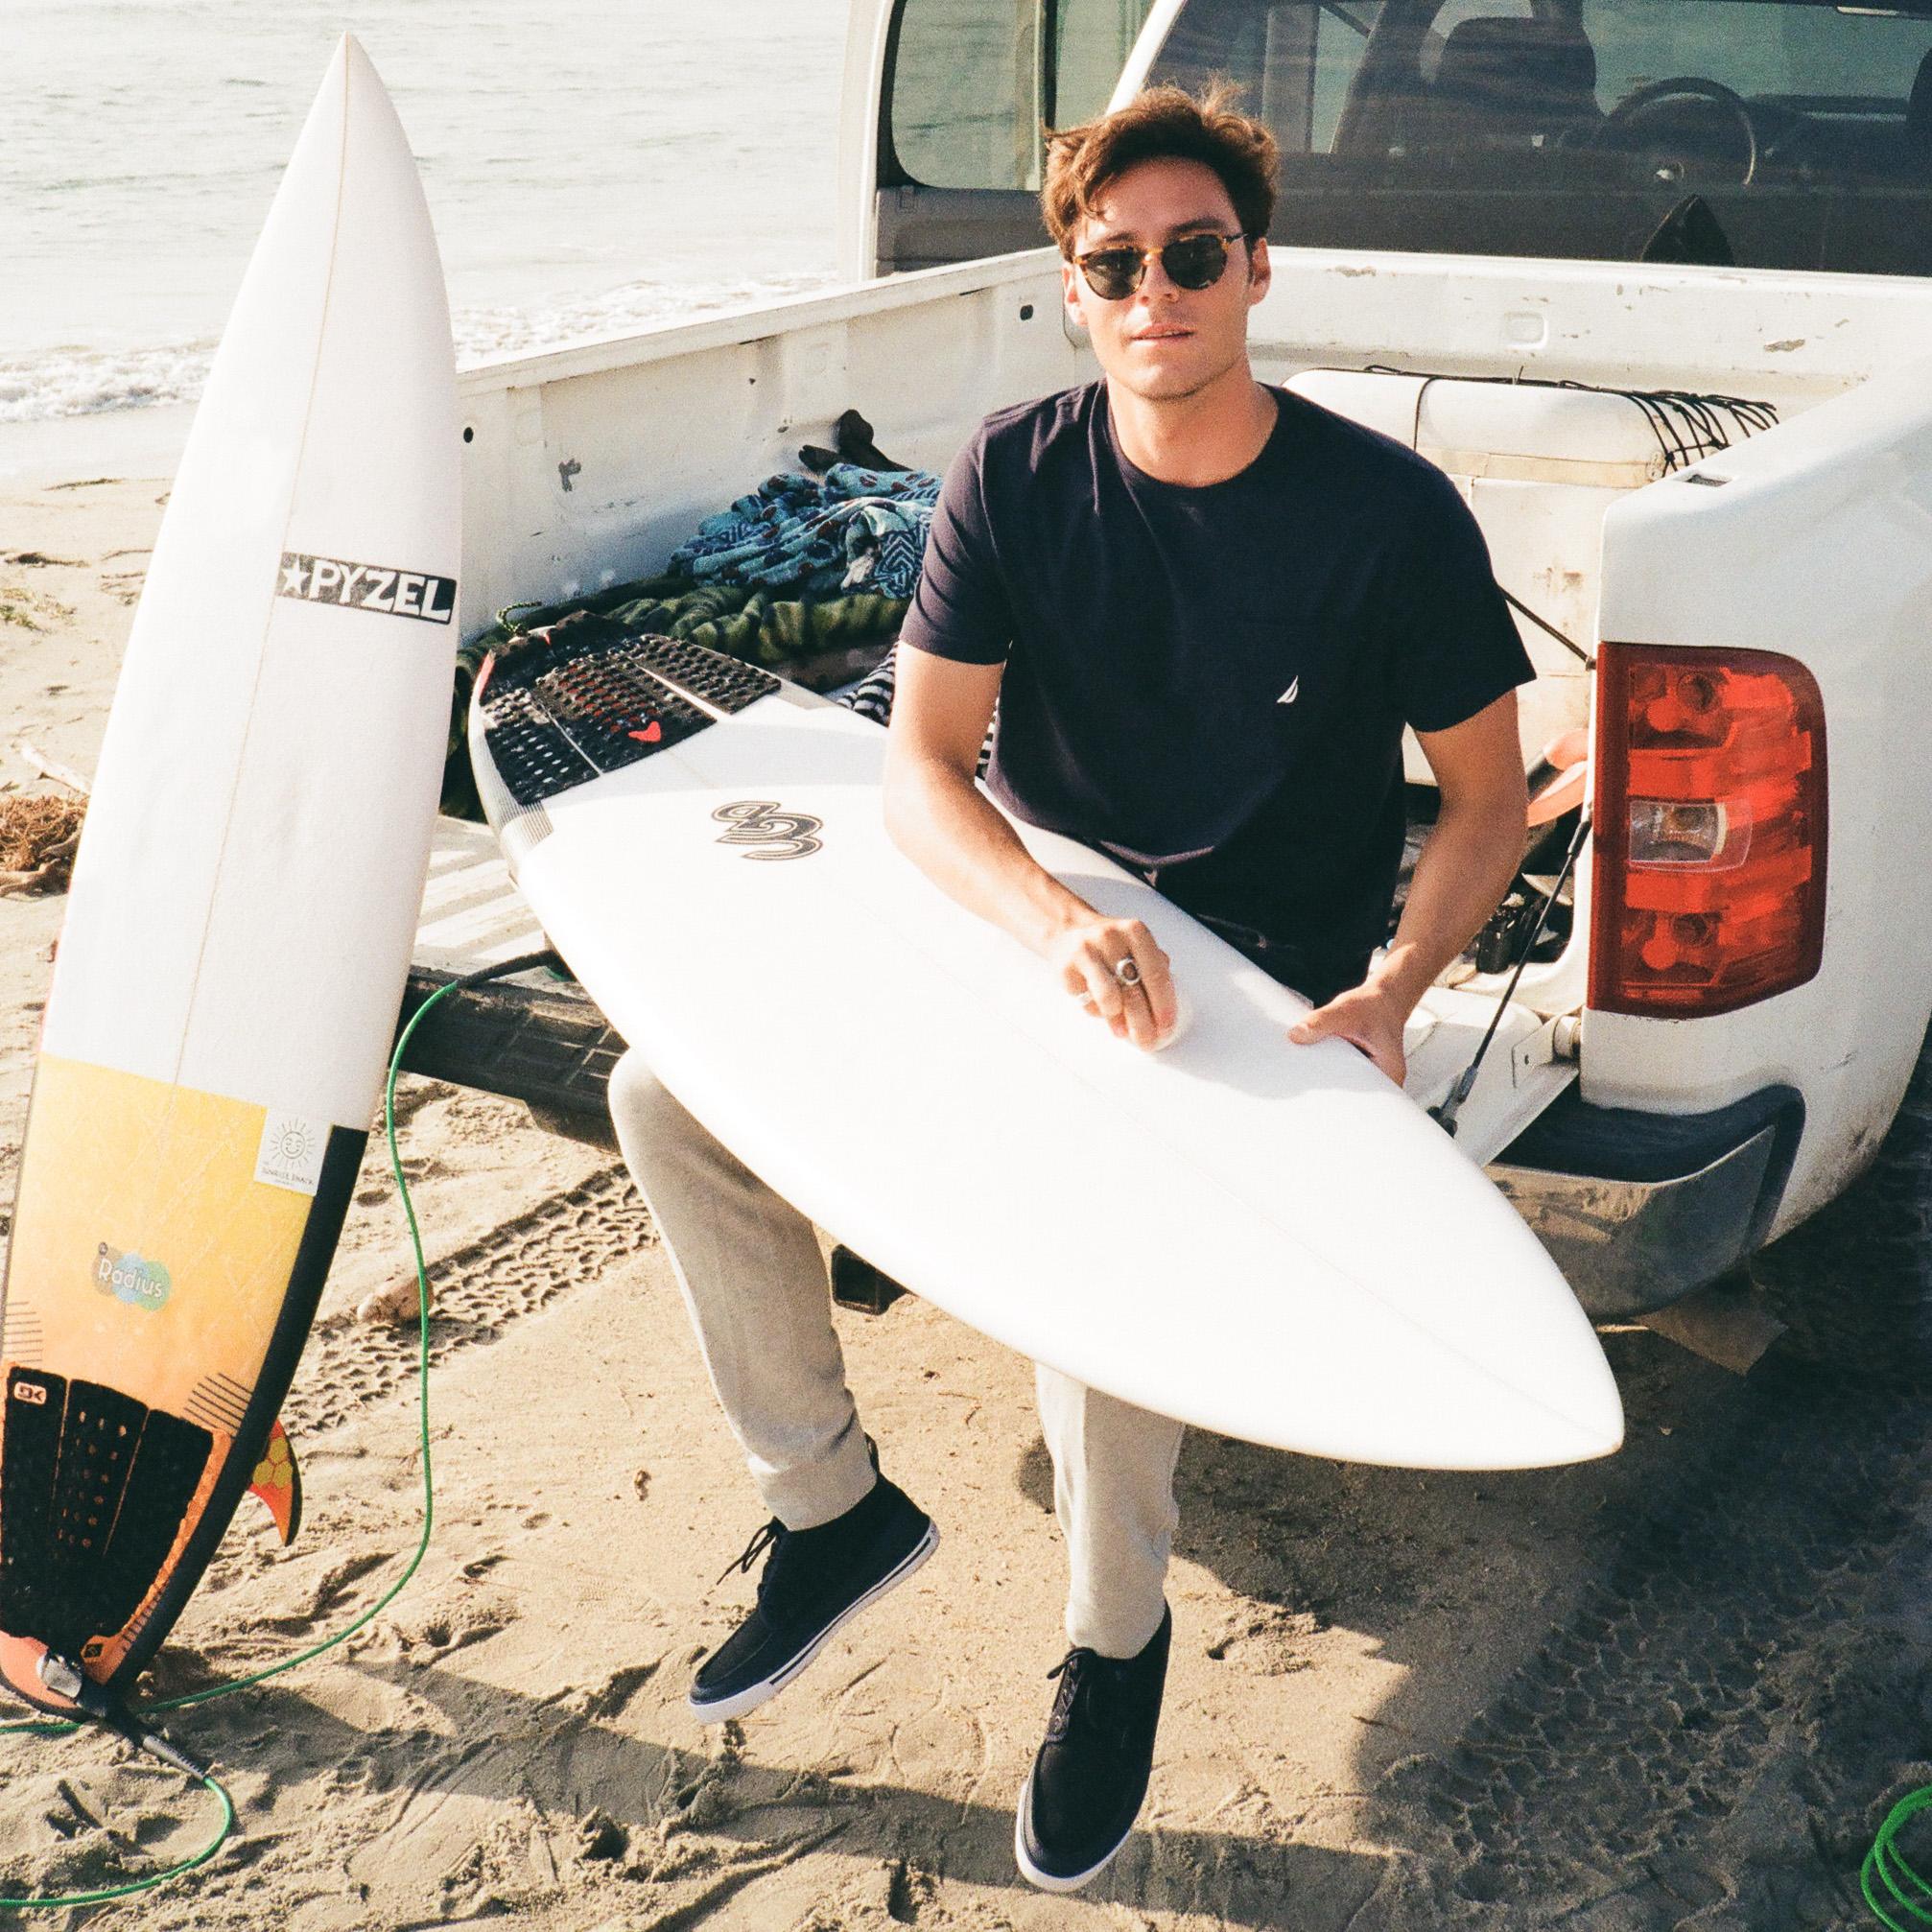 captainbarto-blog-adambartoshesky-model-nautica-client-mexico-surf-trip-mexican-mirage-september-2018--4.jpg